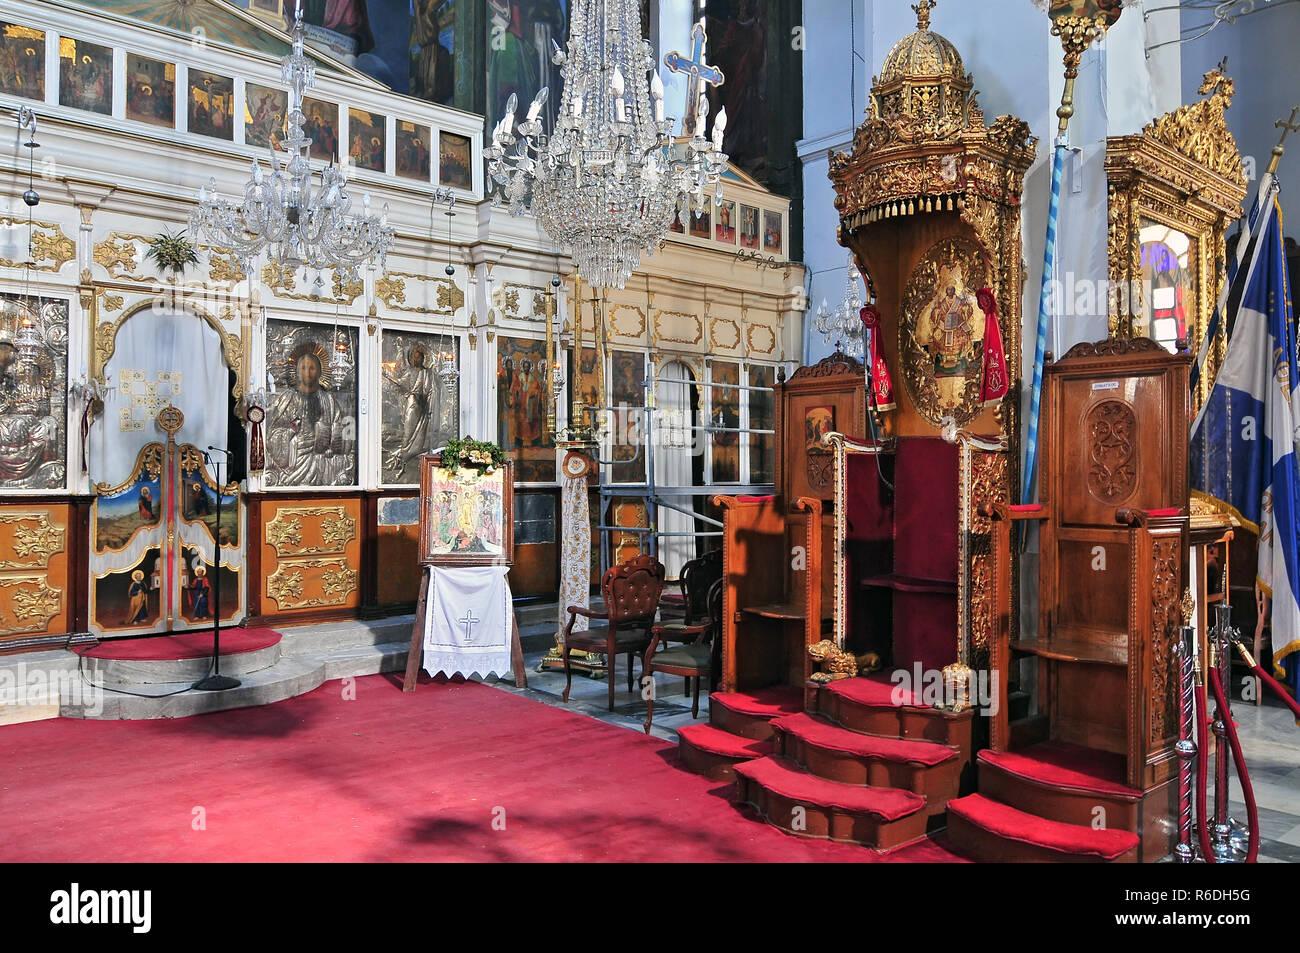 Interior Of The Greek Orthodox Cathedral Dedicated To Panagia Trimartyri Chania Crete Stock Photo